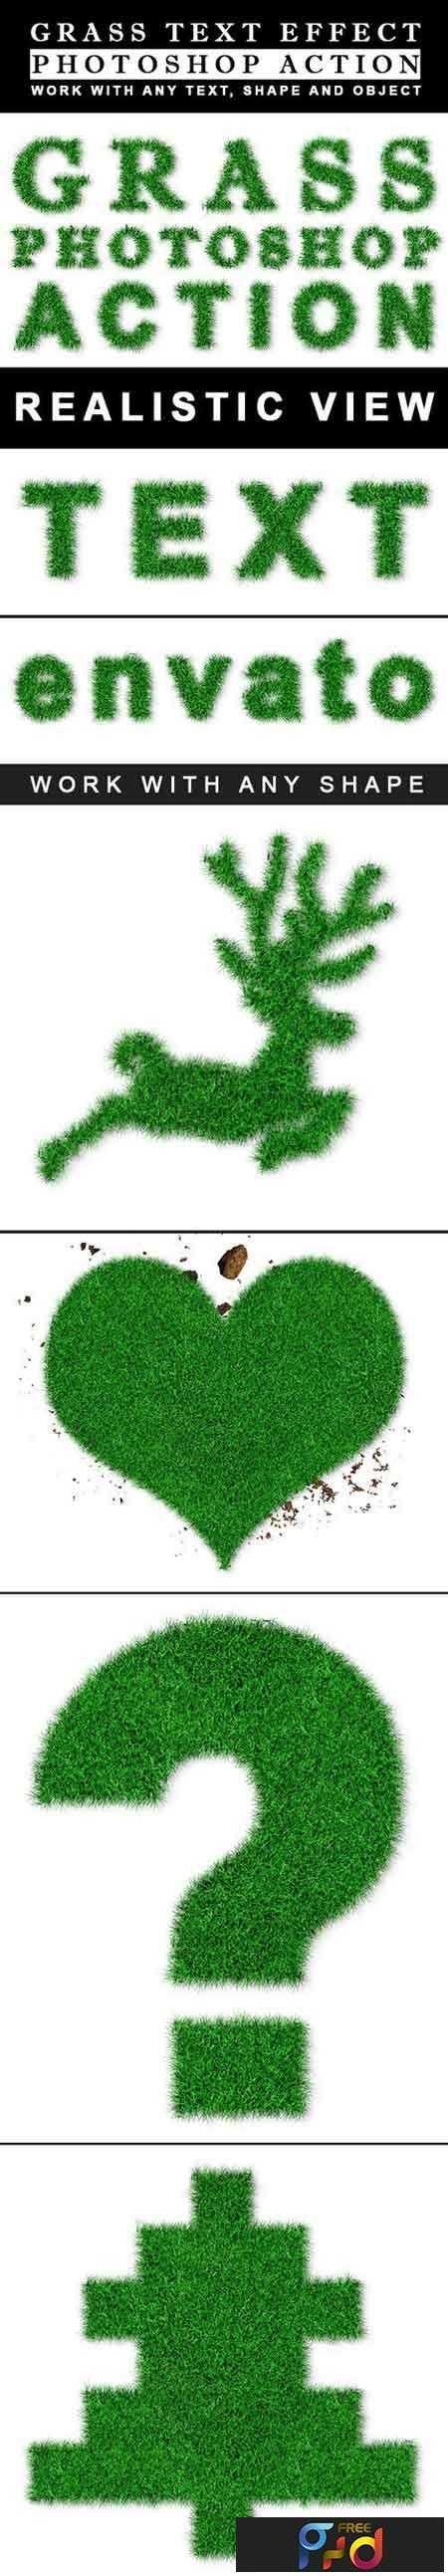 1810158 Grass Effect Generator Action 22257612 1